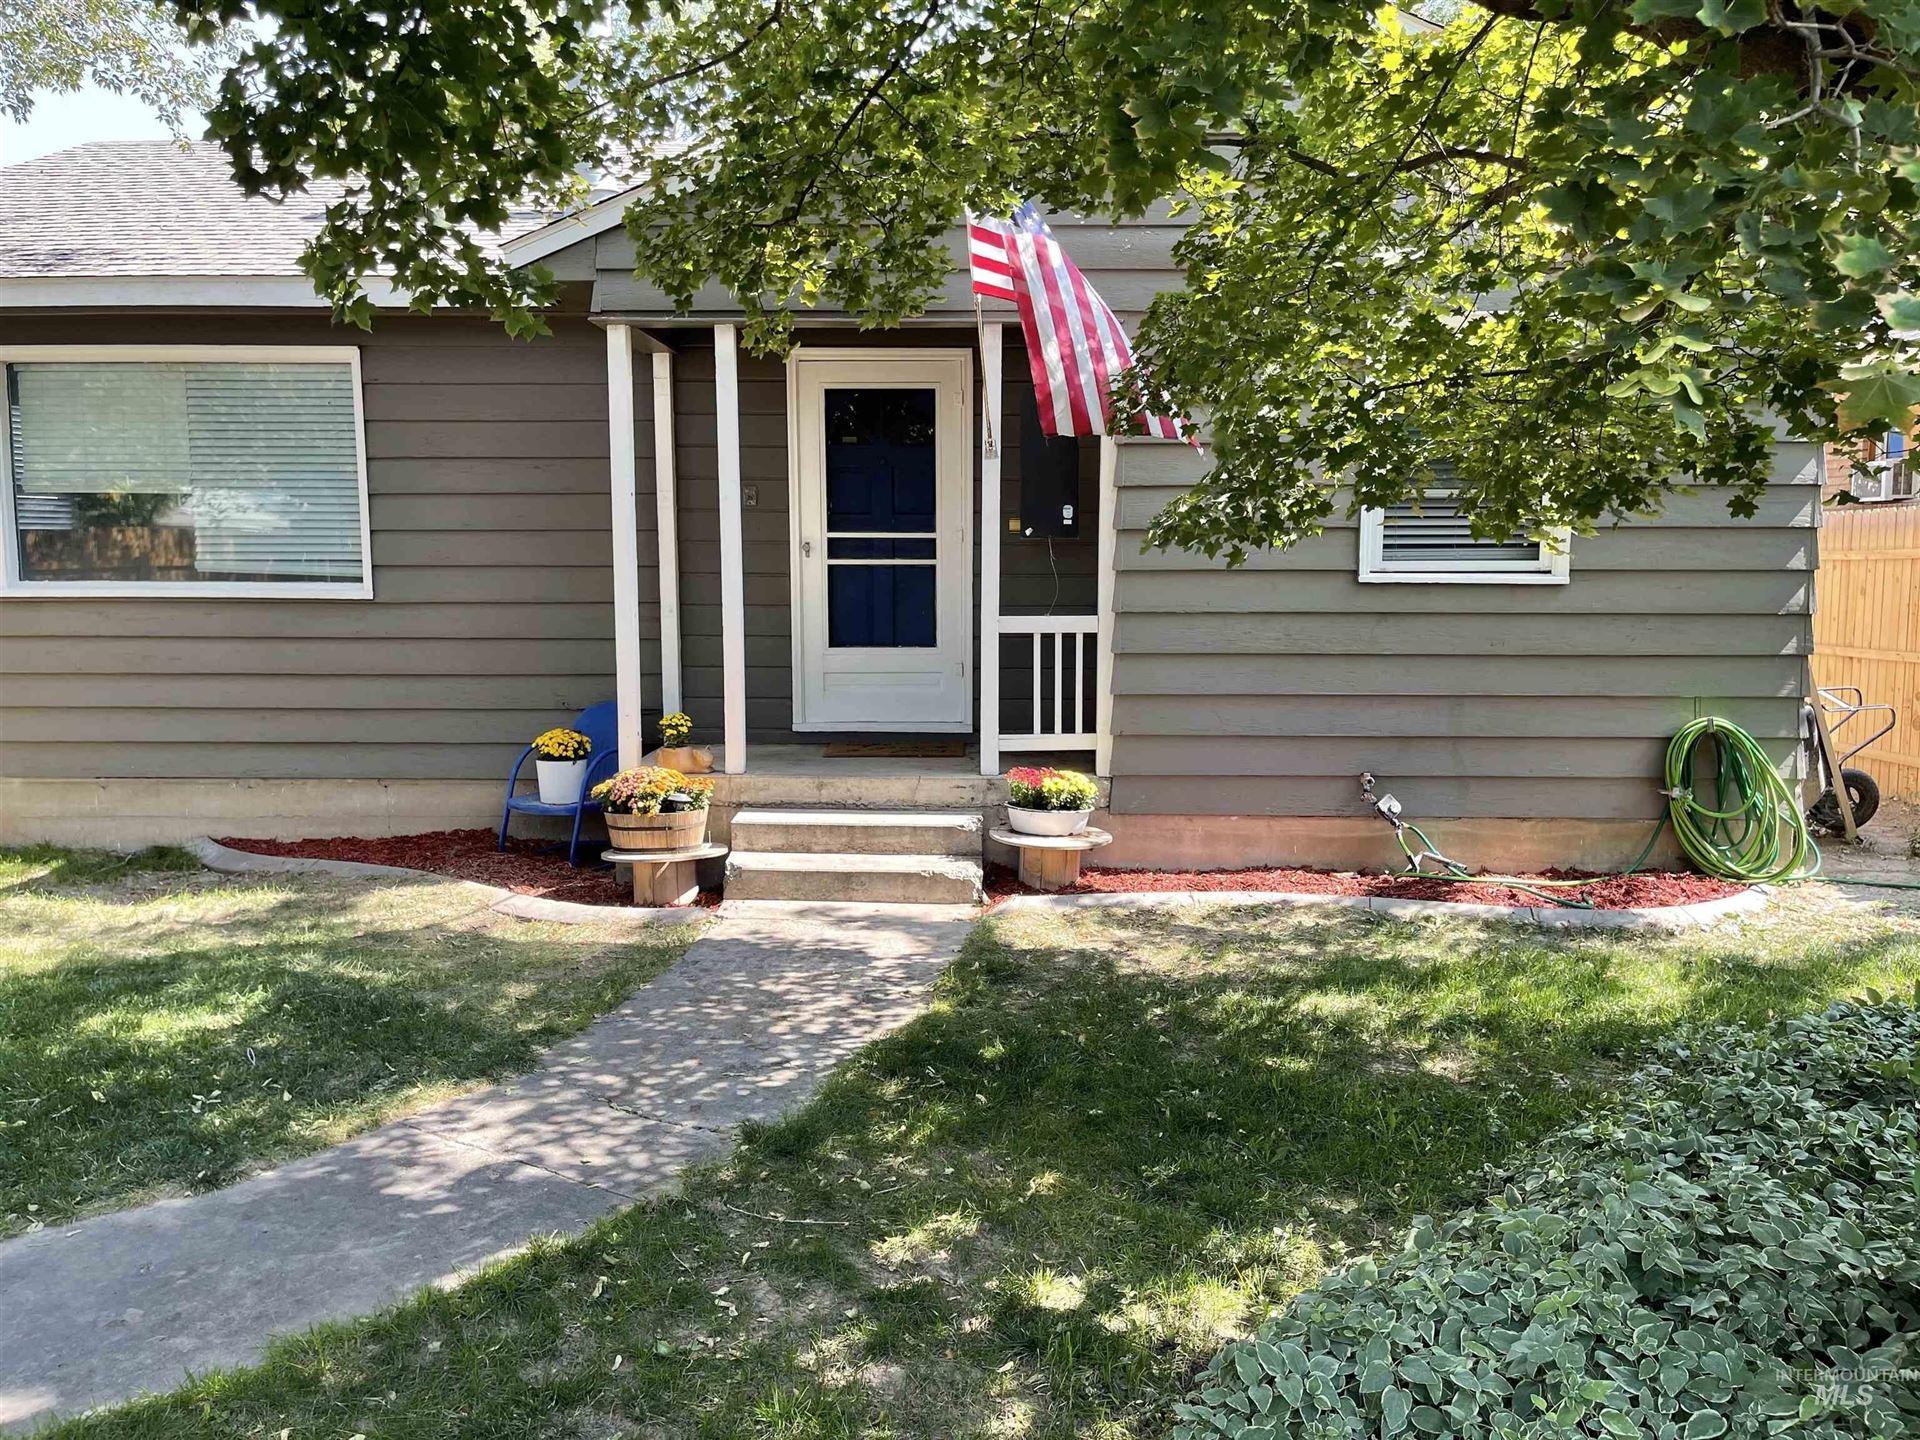 Photo of 336 Washington, Twin Falls, ID 83301 (MLS # 98819338)